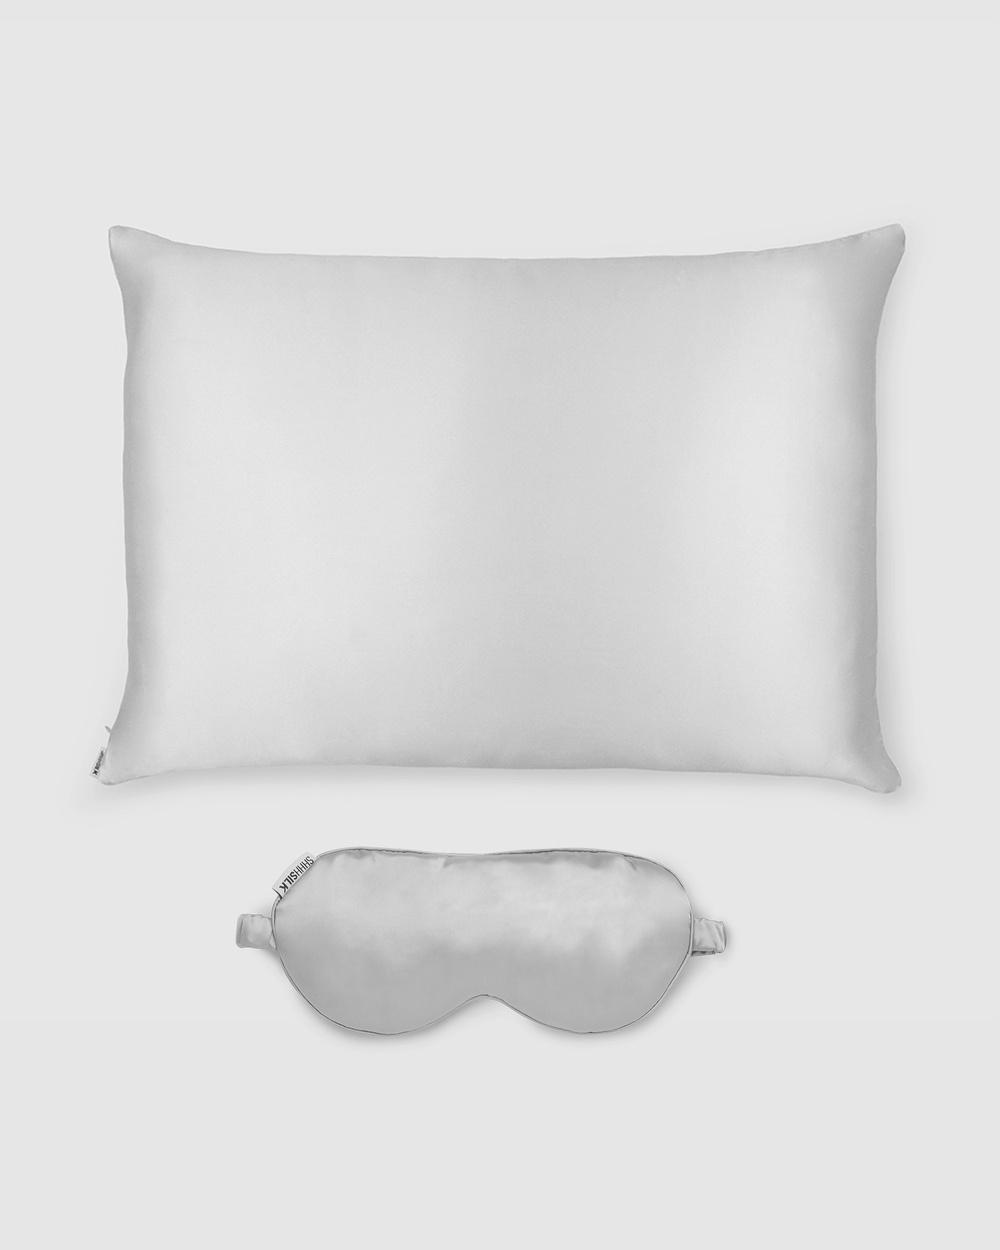 Shhh Silk Eye Mask and Pillowcase Sleep Grey